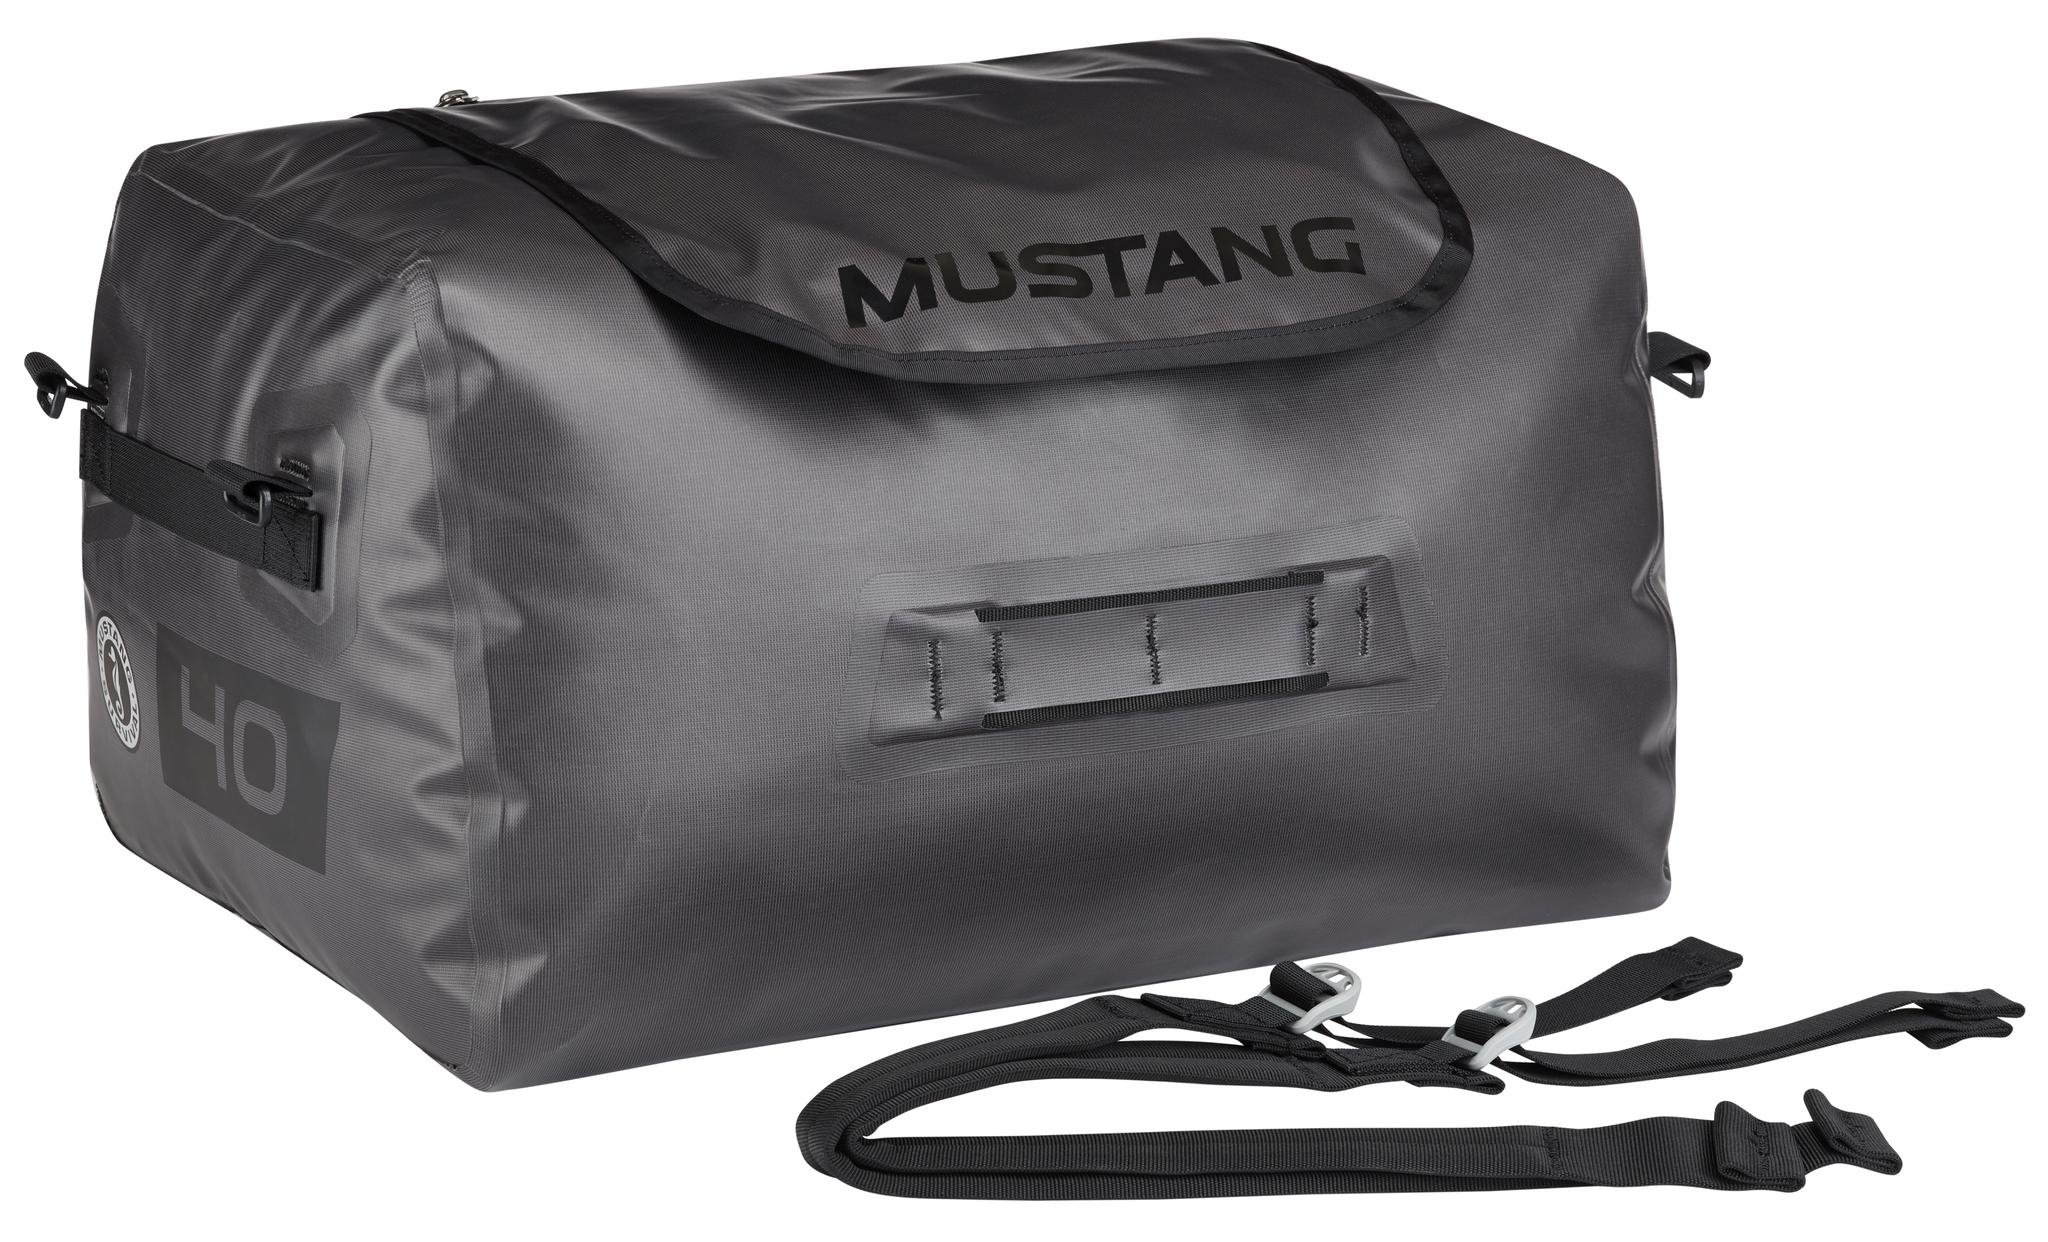 Mustang Survival Unveils New Kayak Gear